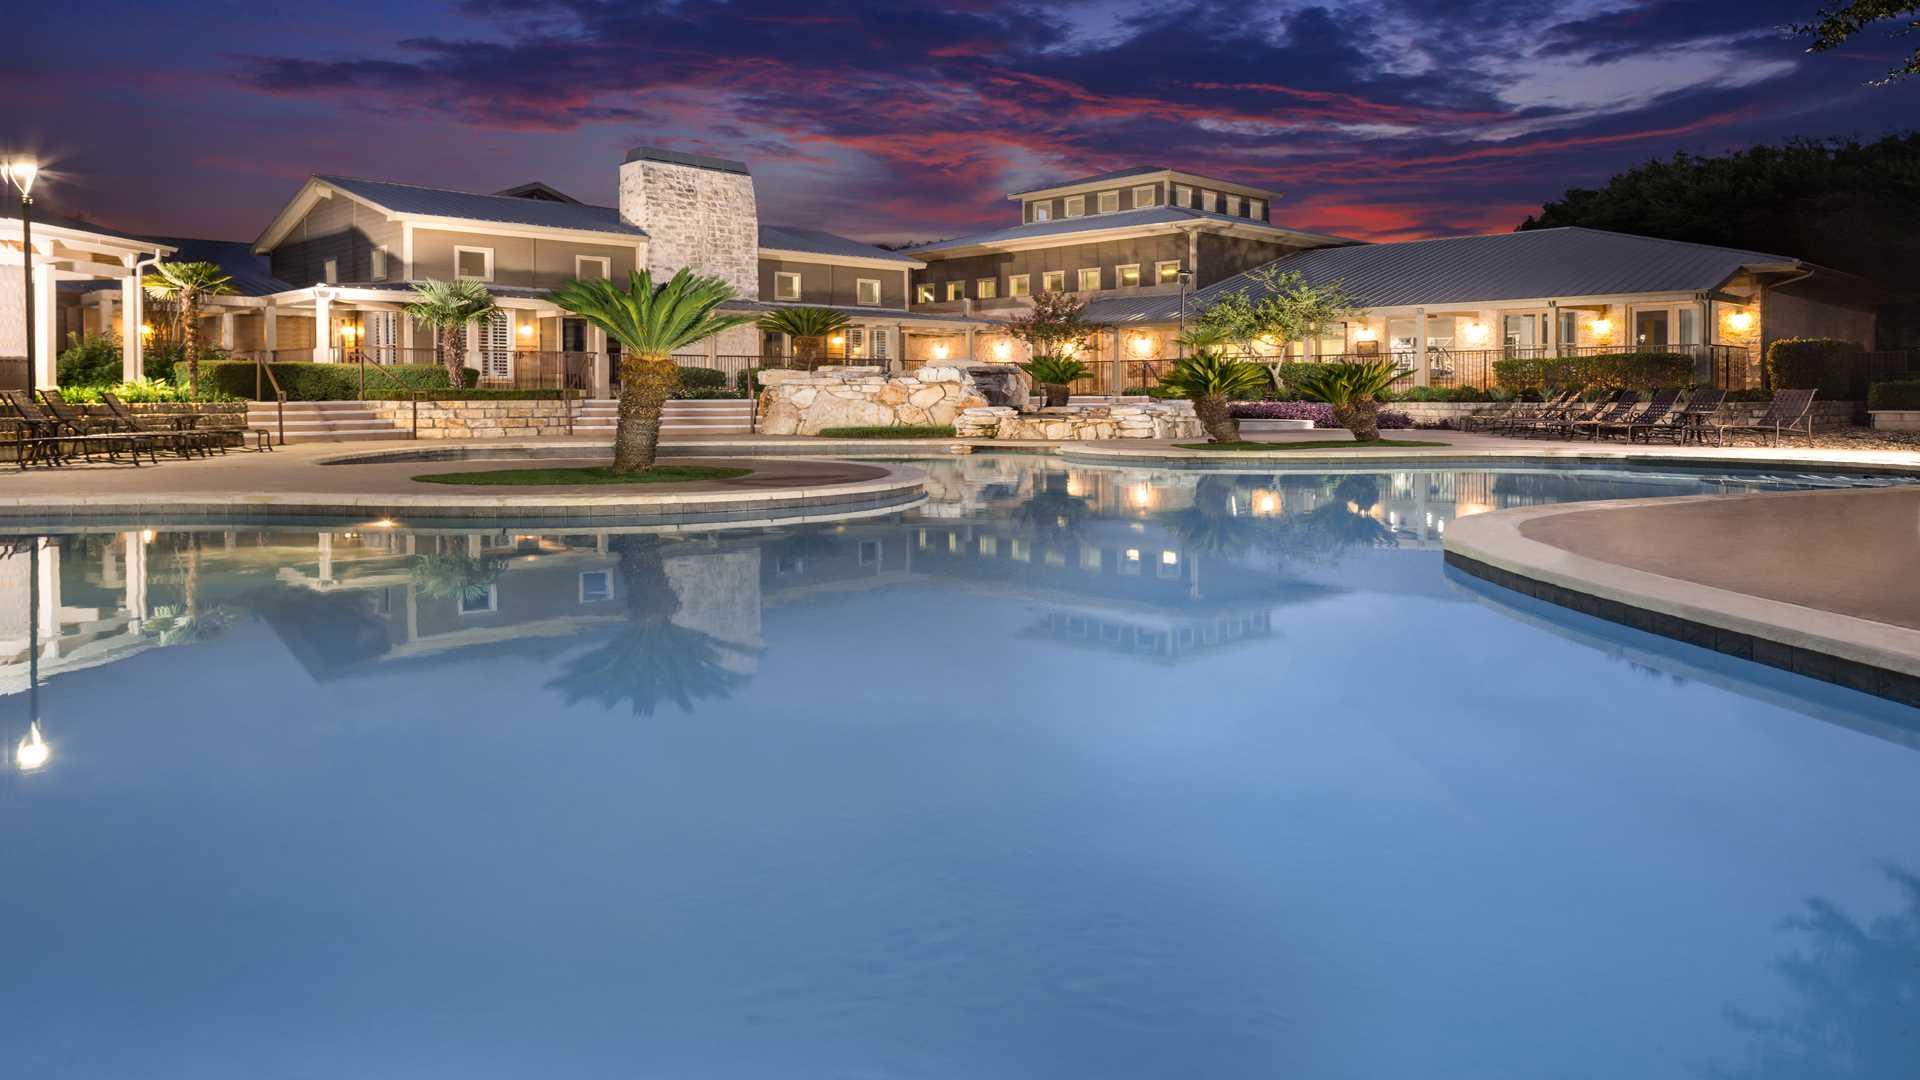 North Austin Apartments | Austin, TX | The Ranch Apartments